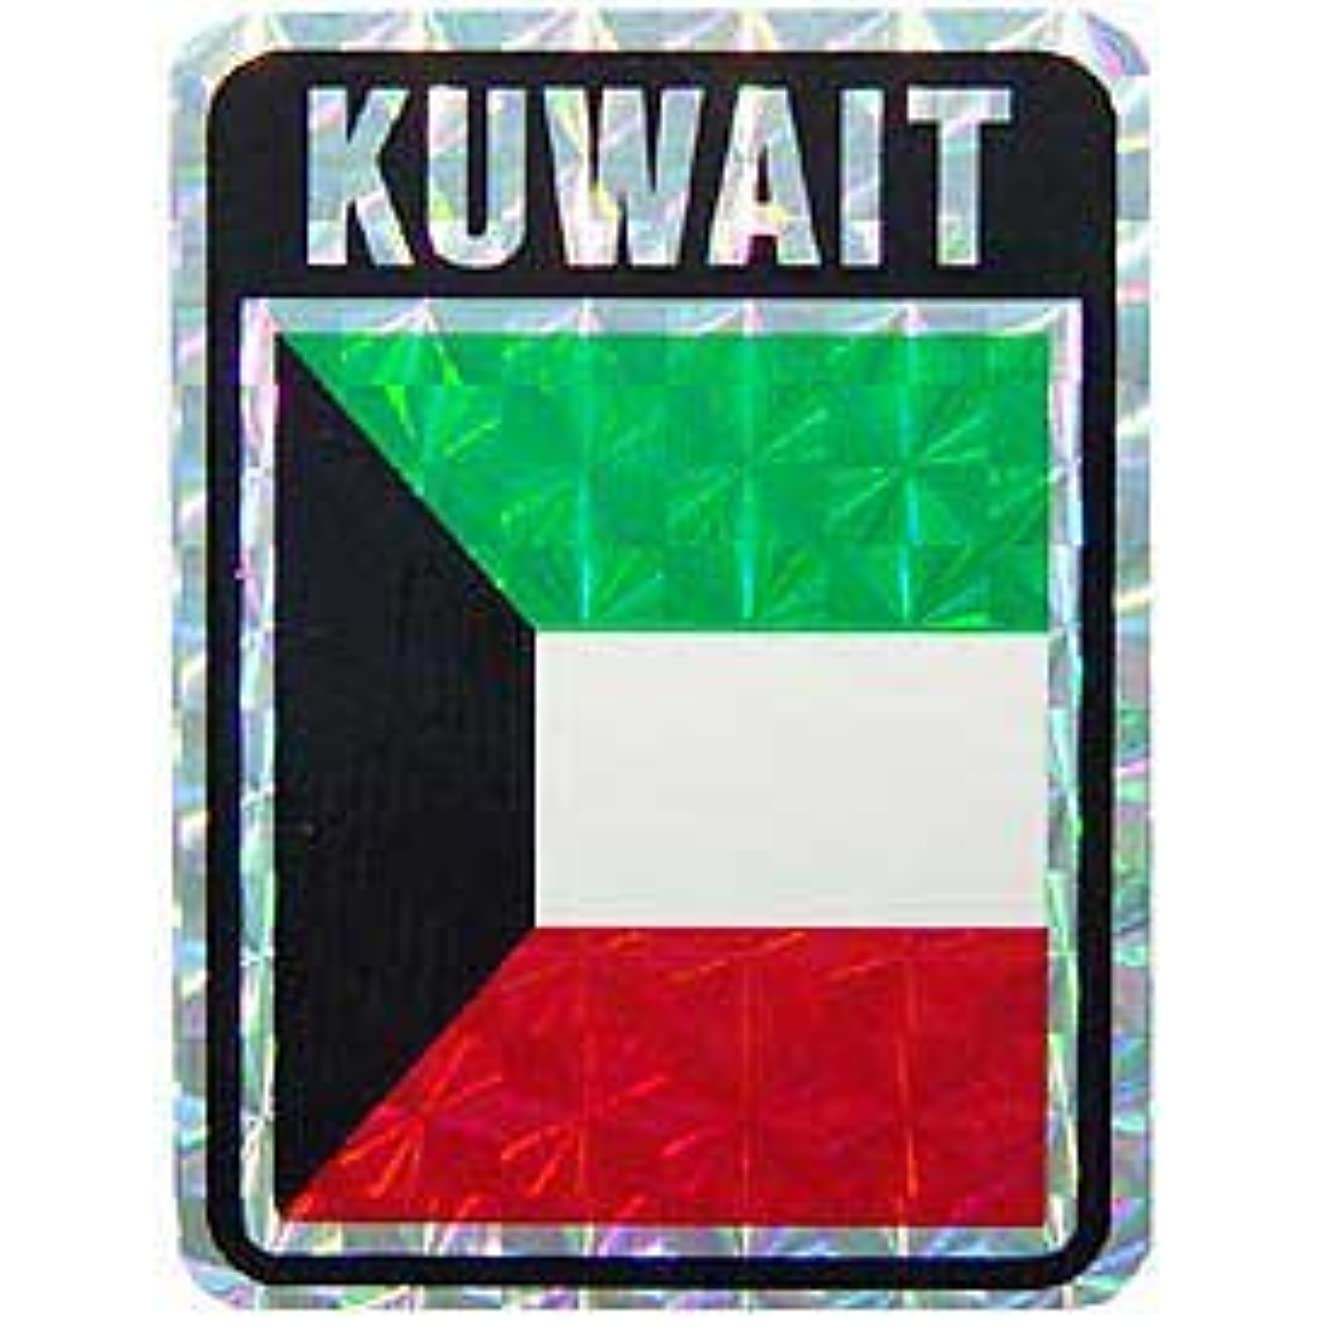 Novelty International World Country Flags Sticker Decal - Kuwait